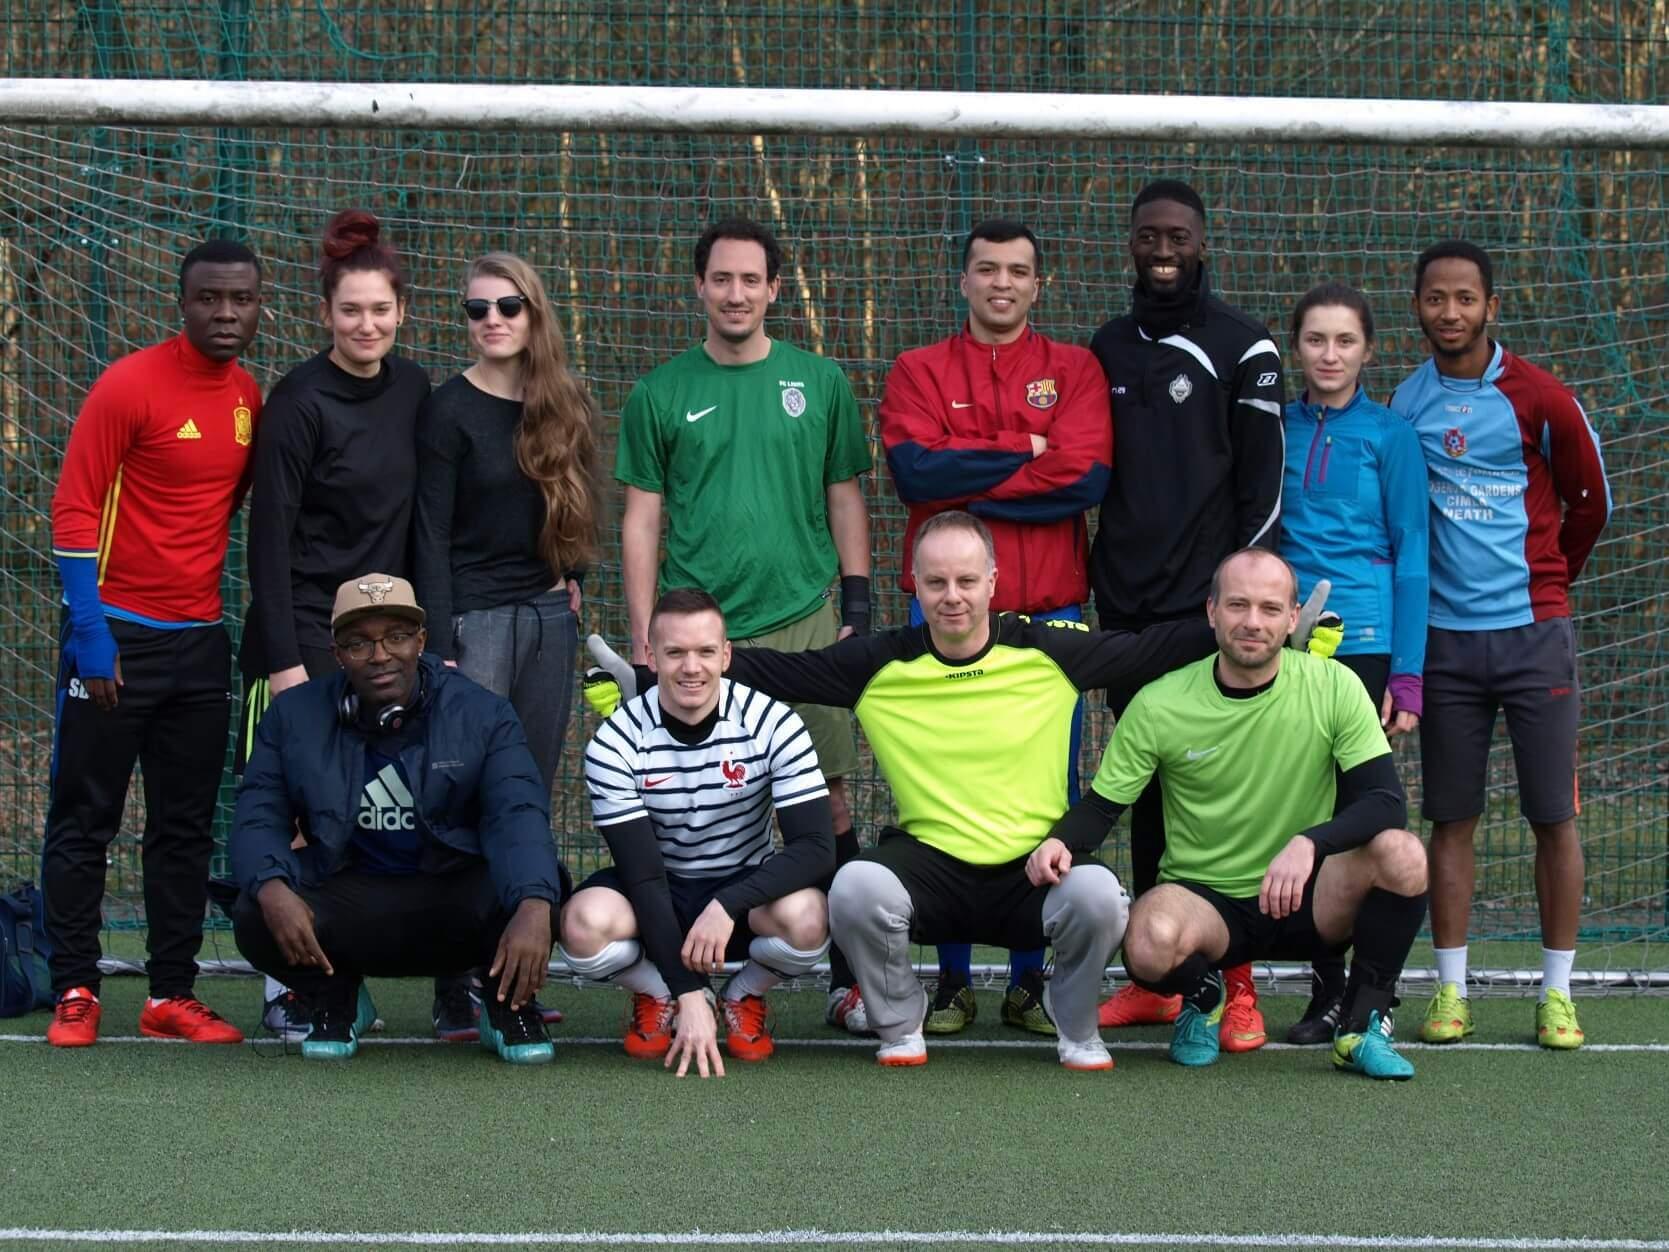 FC Lions